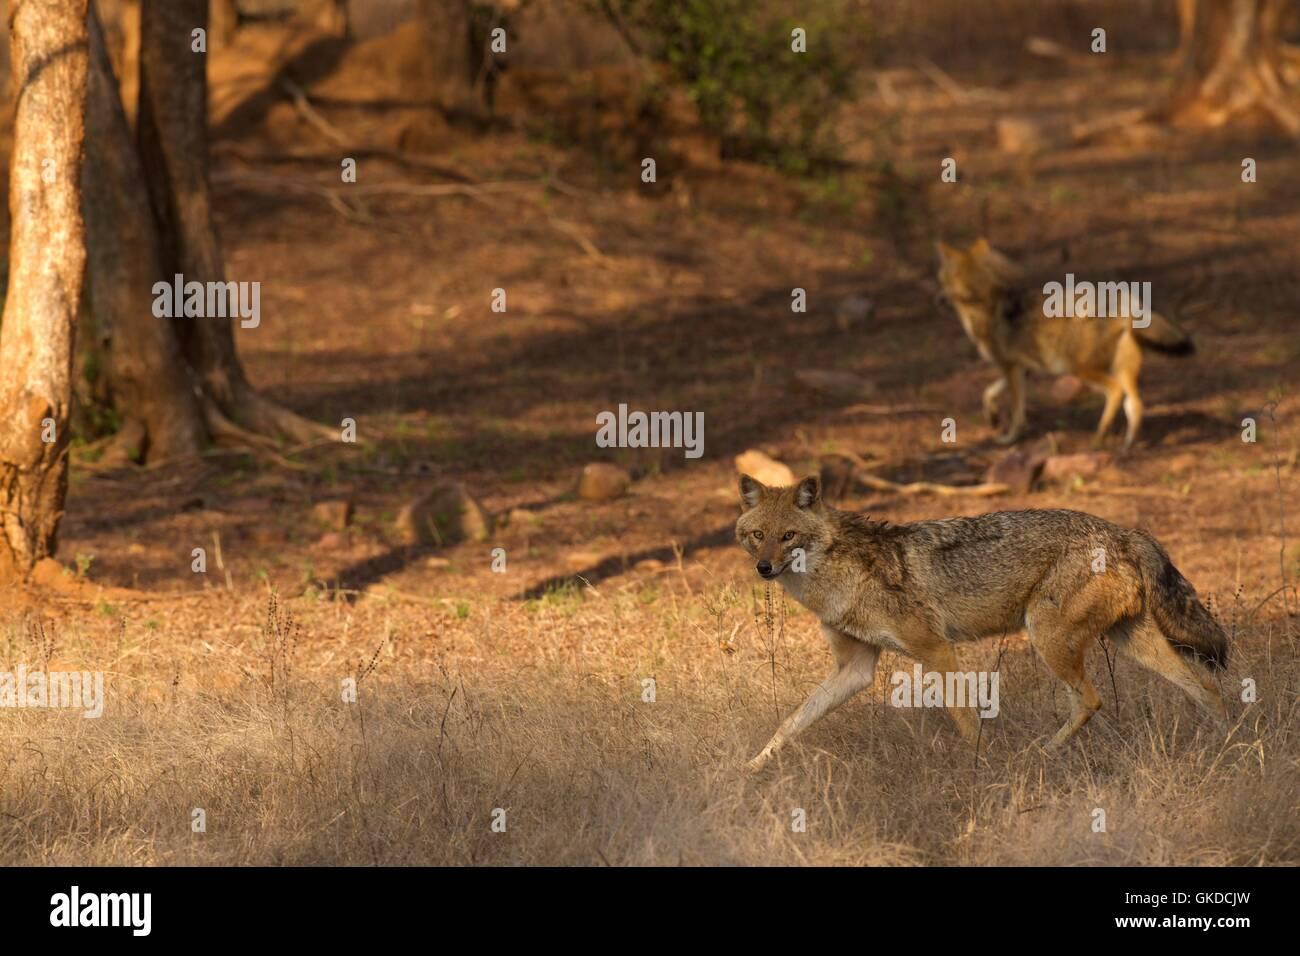 Golden Schakale, Canis aureus, Ranthambore Nationalpark, Rajasthan, Indien, Asien Stockfoto